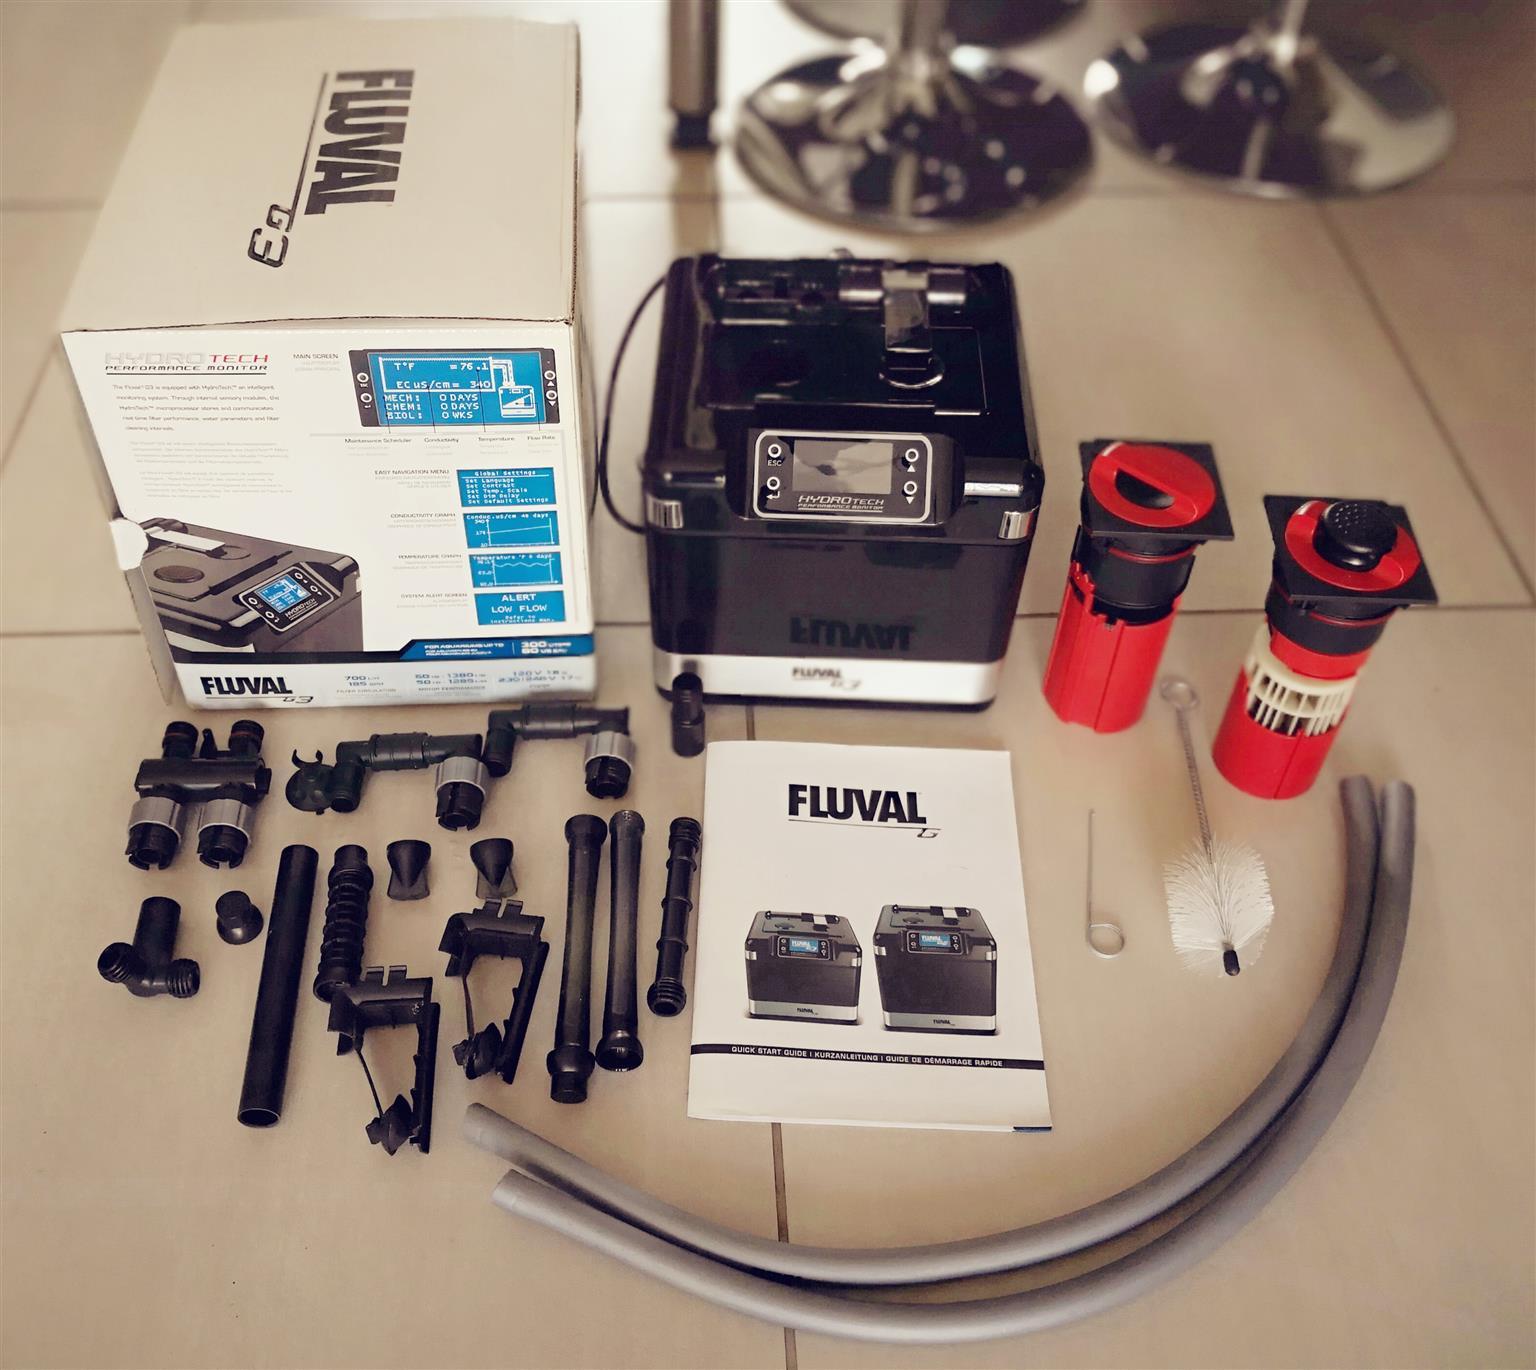 Fluval G3 Hydro Tech filter pump